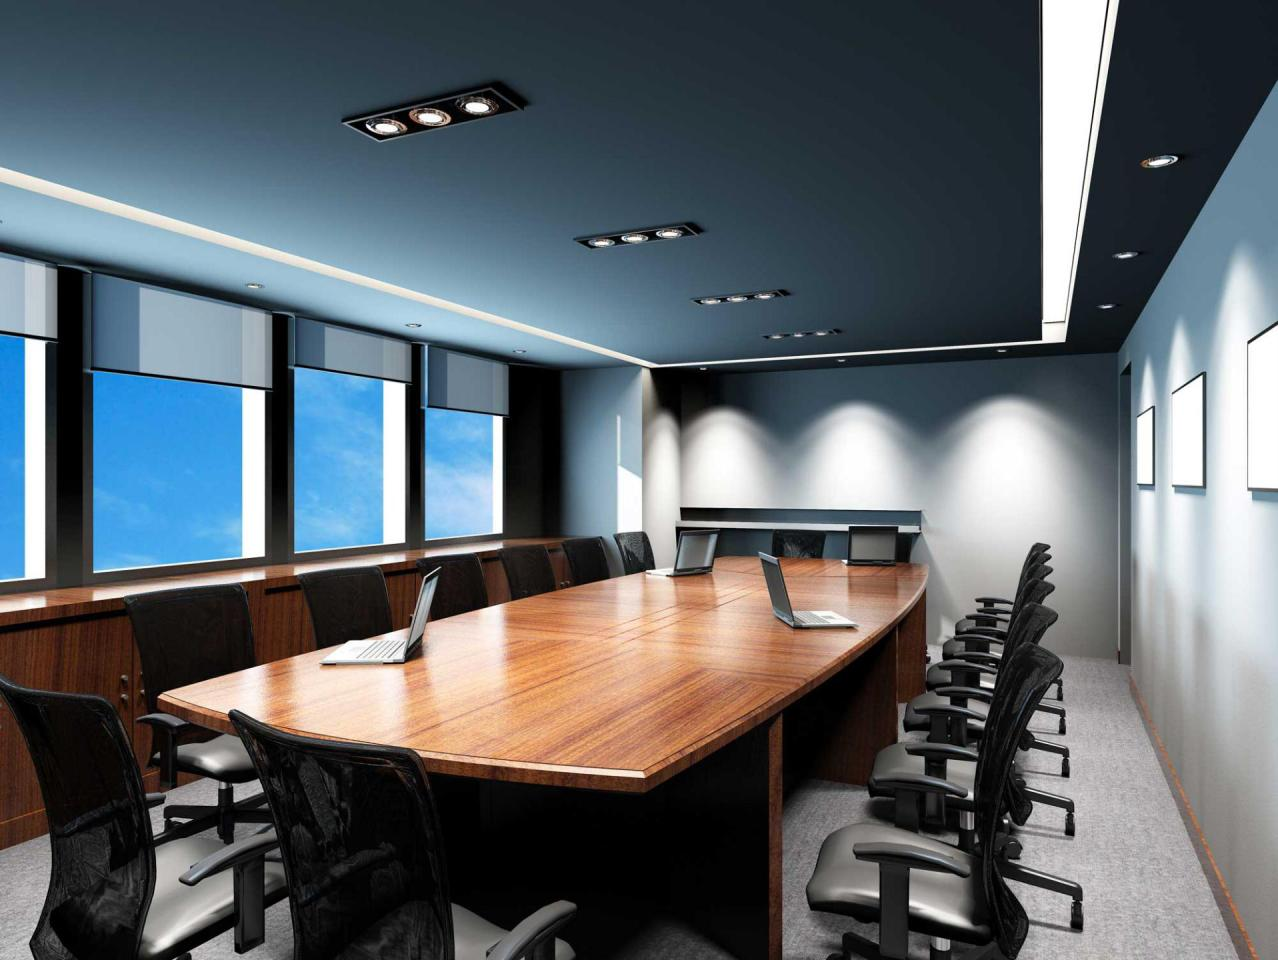 Office Building Sanitizing Service